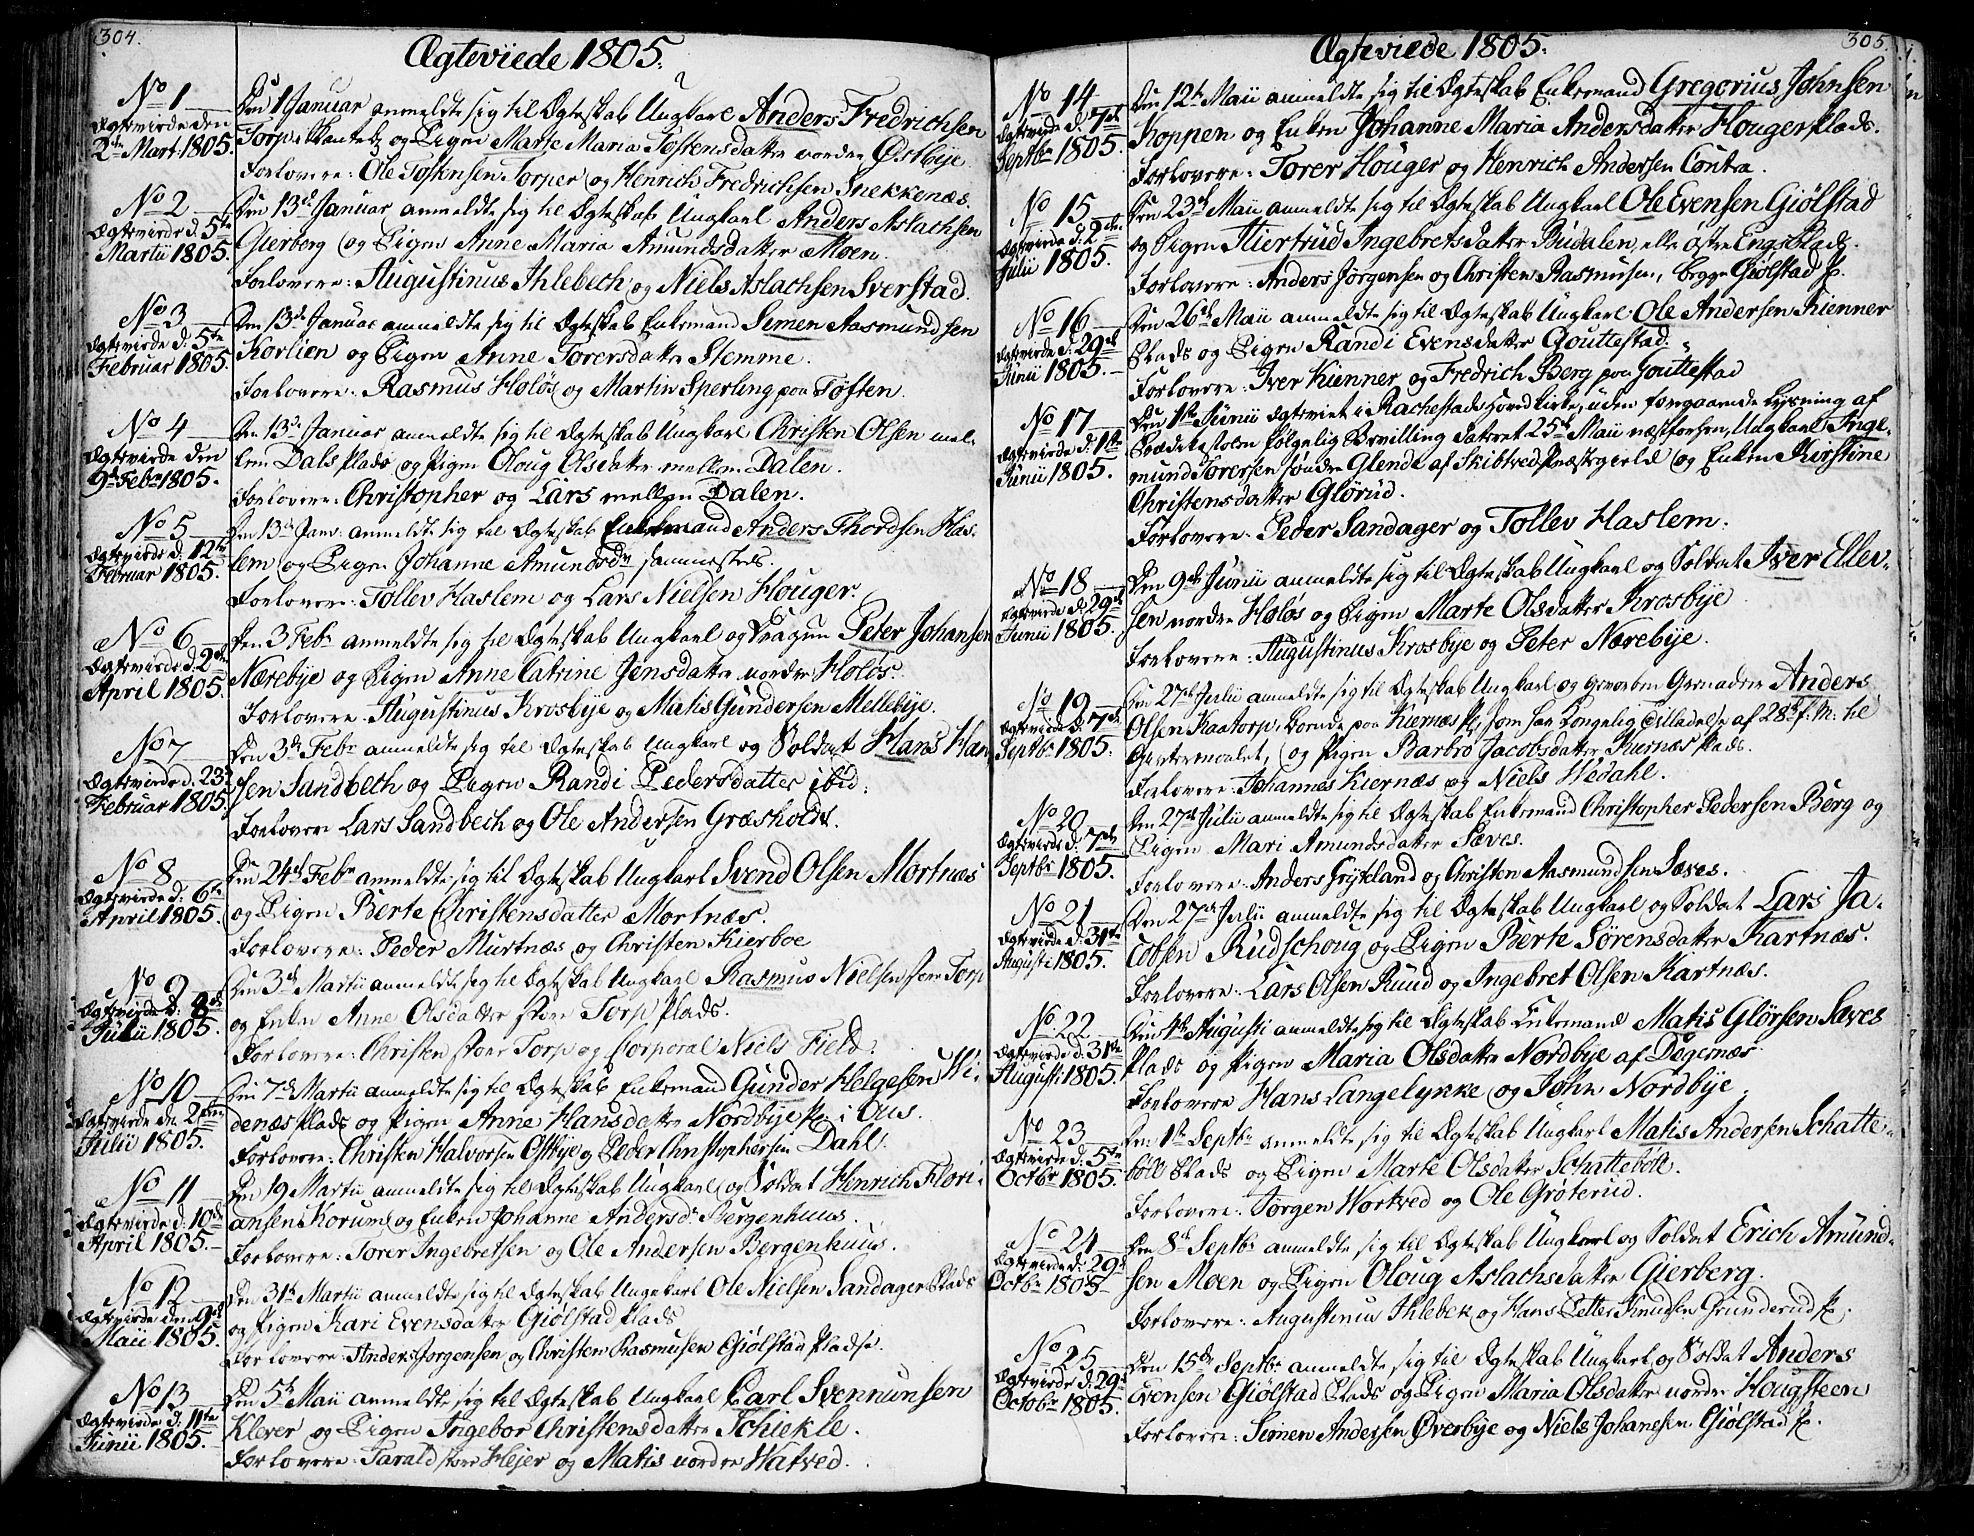 SAO, Rakkestad prestekontor Kirkebøker, F/Fa/L0005: Ministerialbok nr. I 5, 1784-1814, s. 304-305